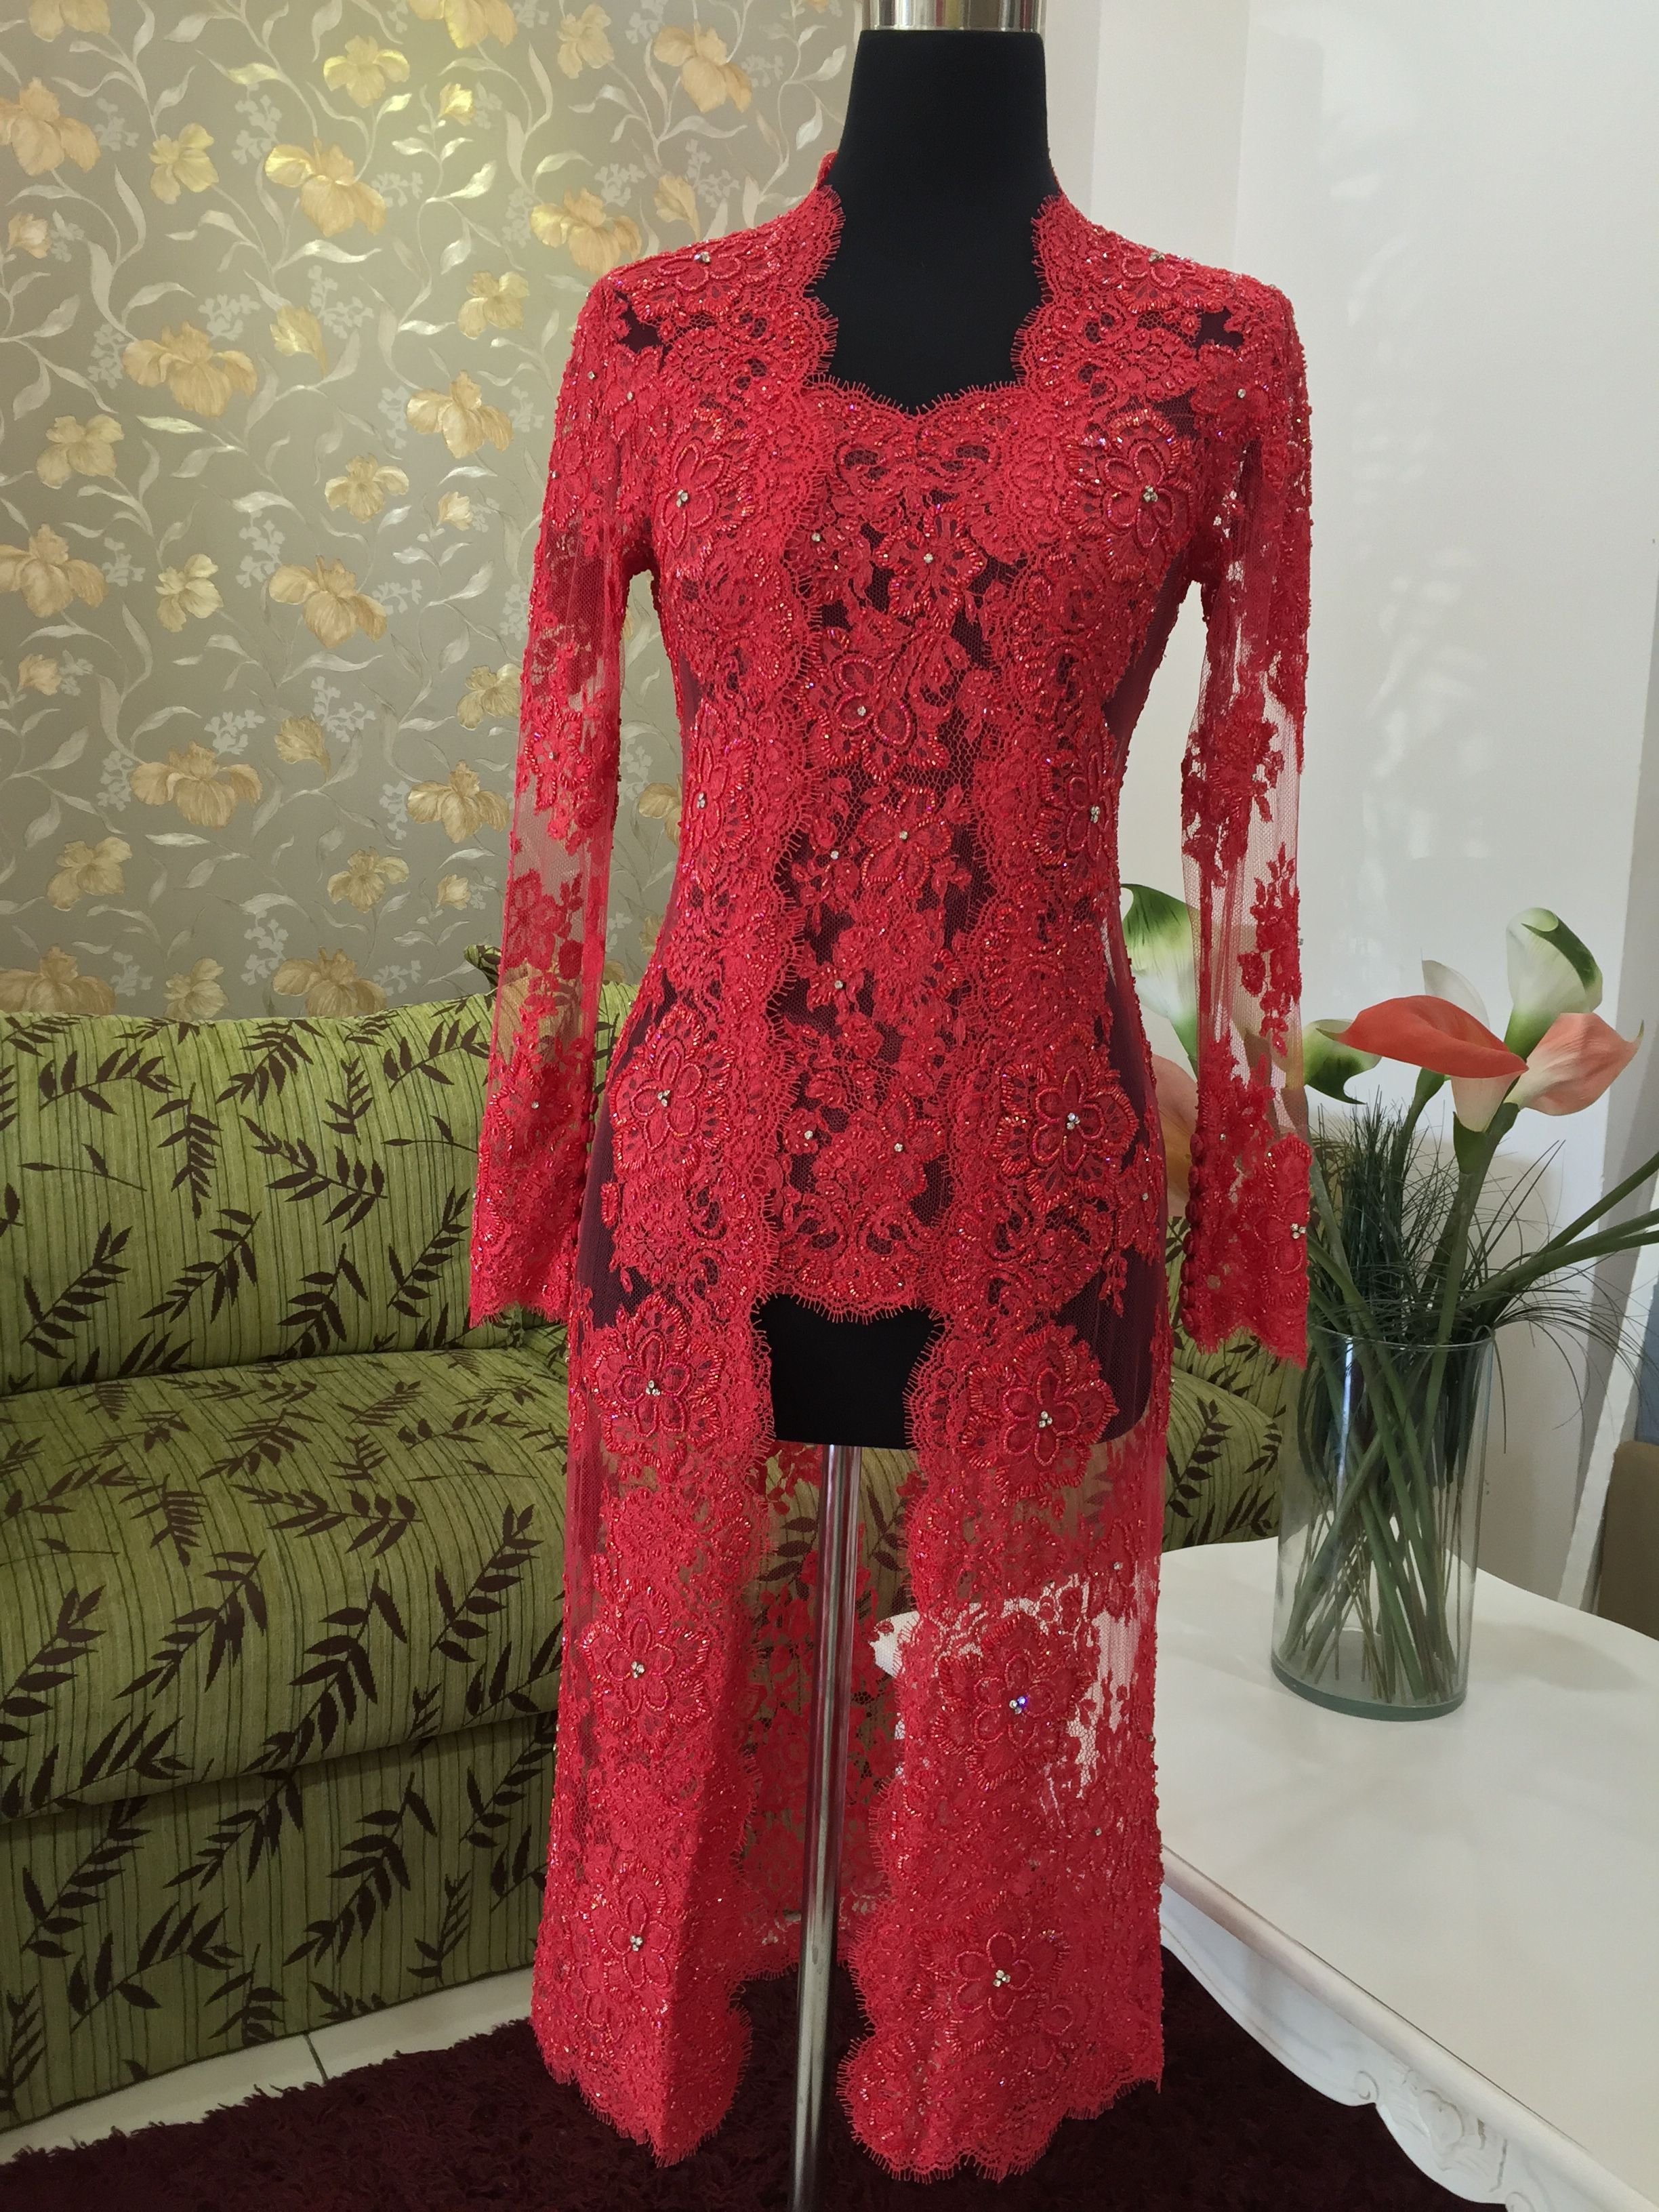 Kebaya Brokat Koronka Kebaya Baju Kurung Indonezyjska Moda Kebaya Panny Młode Haft